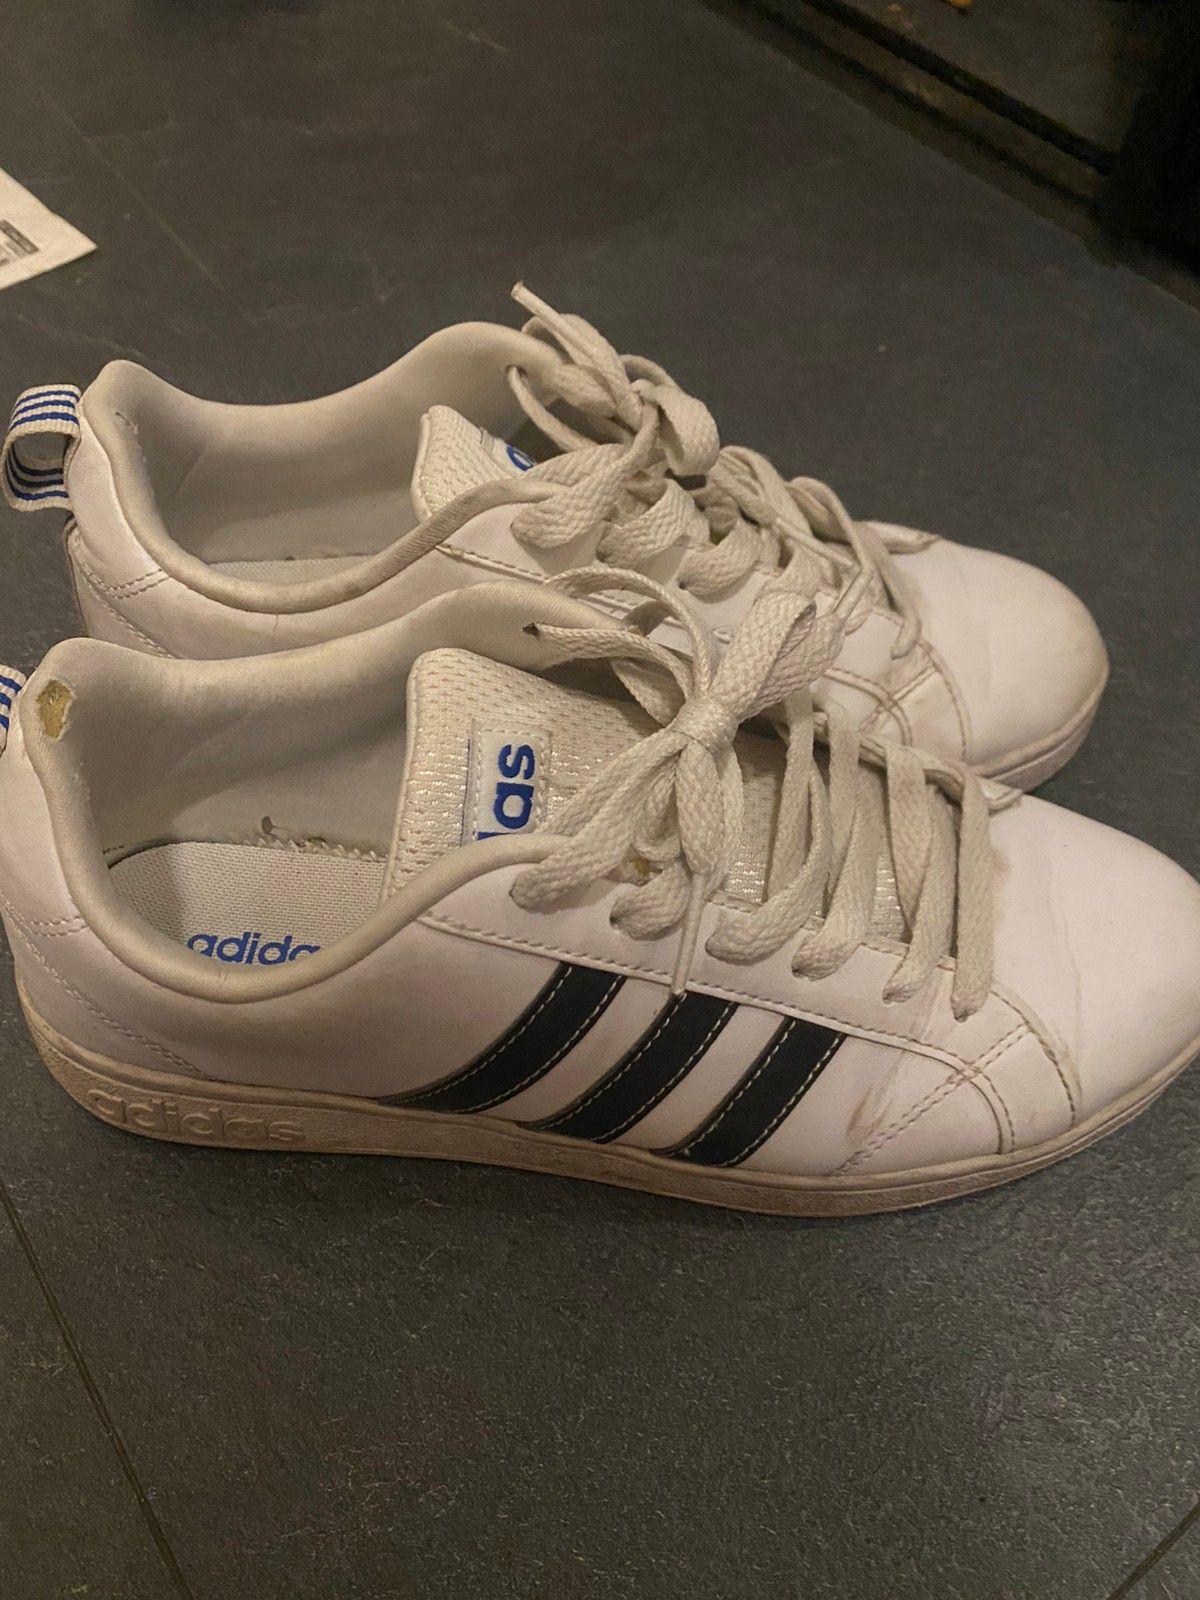 36.5 38 Sko til salg(Adidas, converse, skono, håndlaget